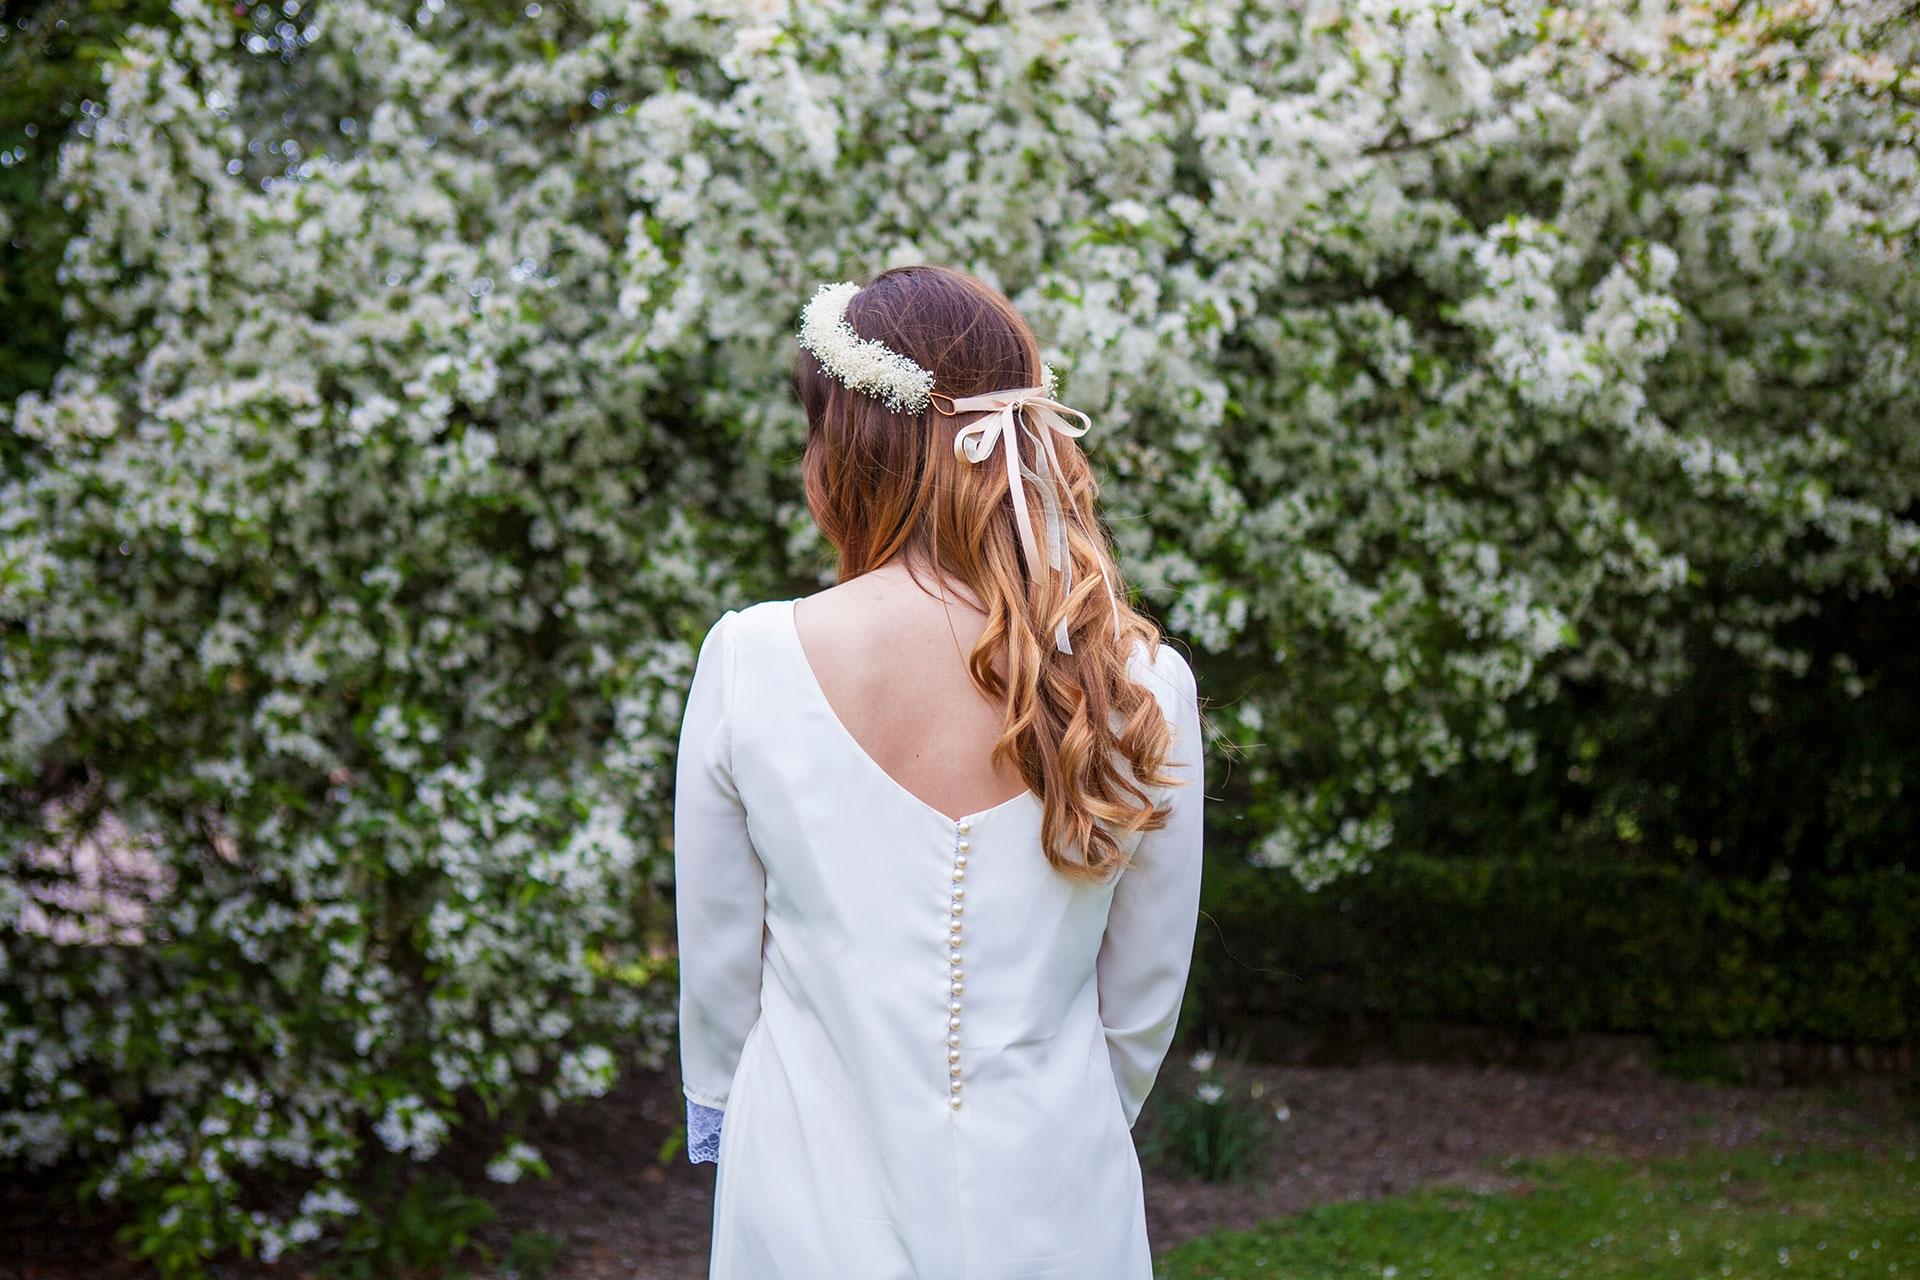 particuliers-evenements-mariages-oui-zelie&valentin-15